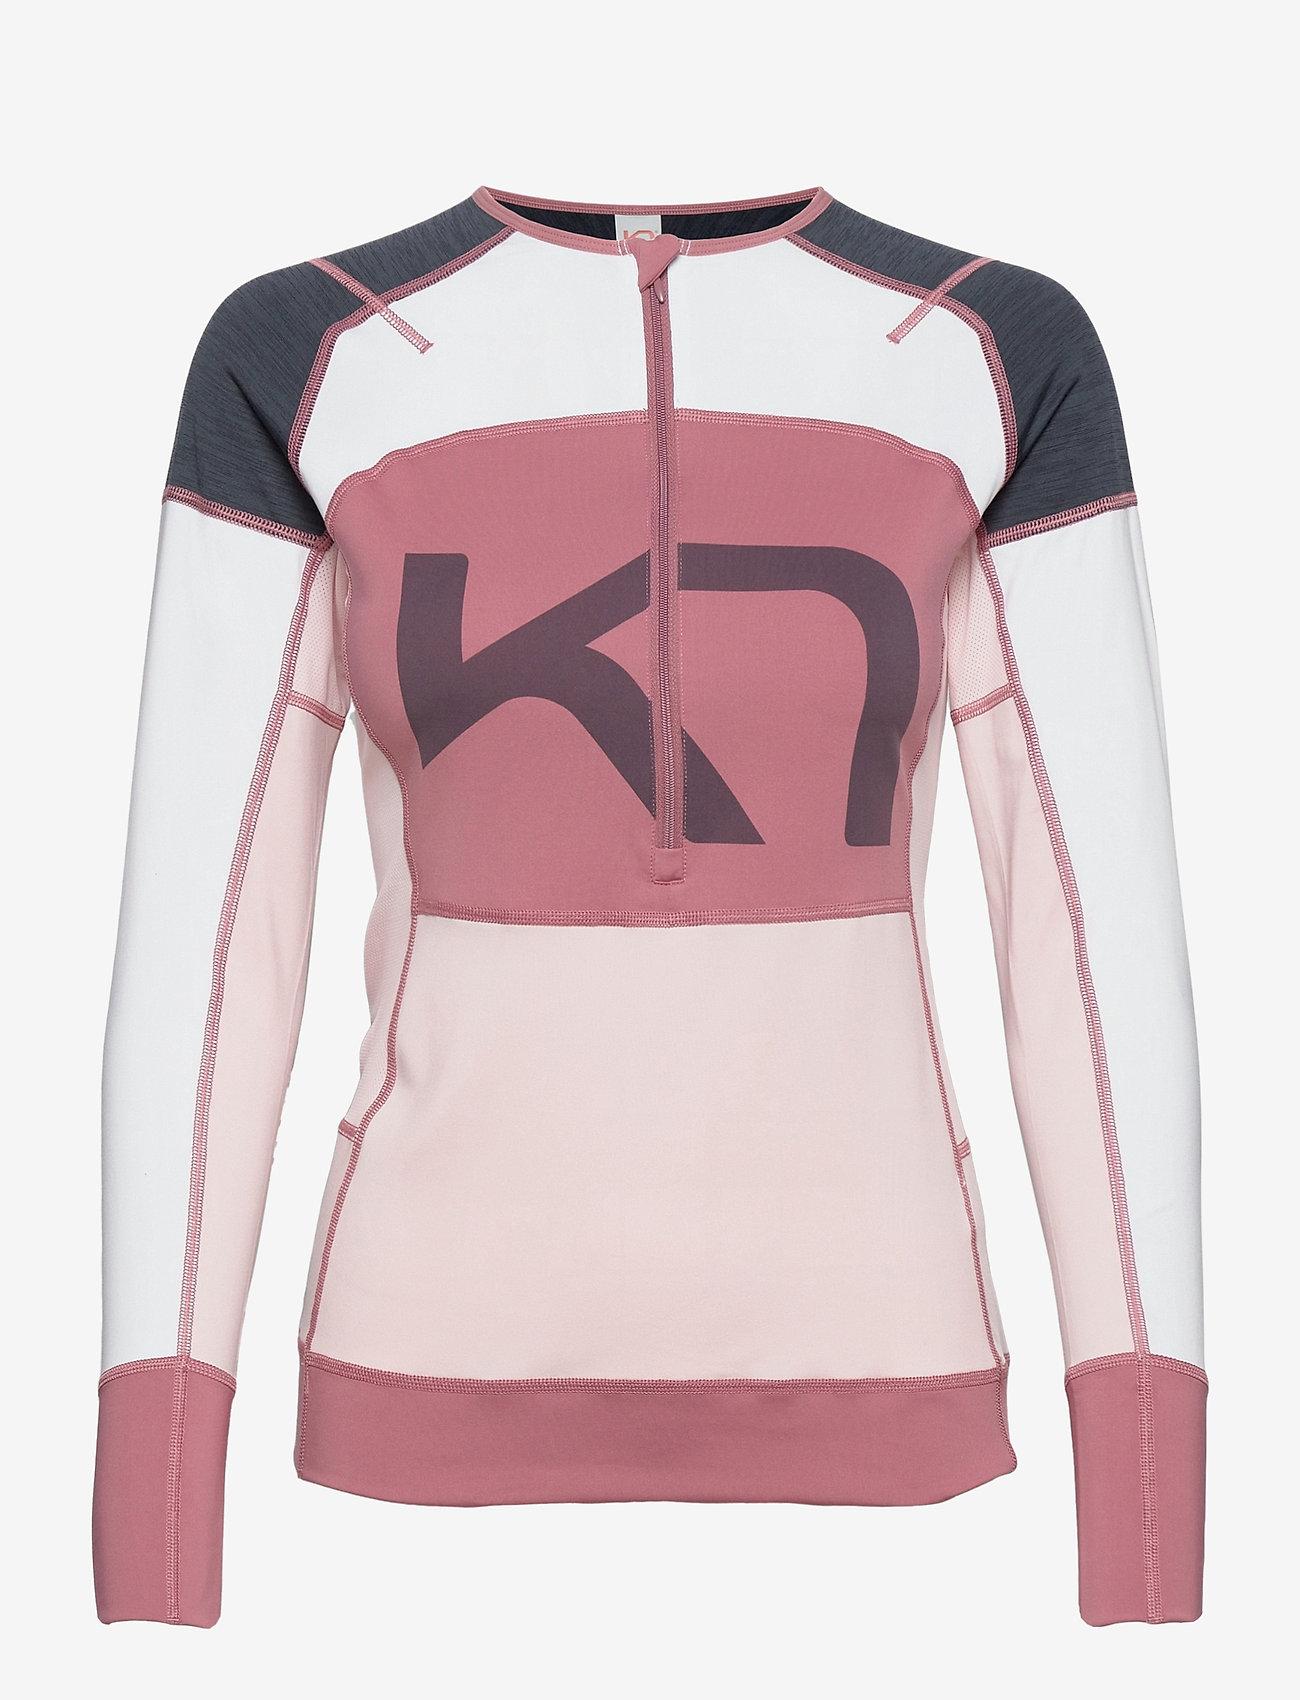 Kari Traa - STIL H/Z - thermo ondershirts - lilac - 0